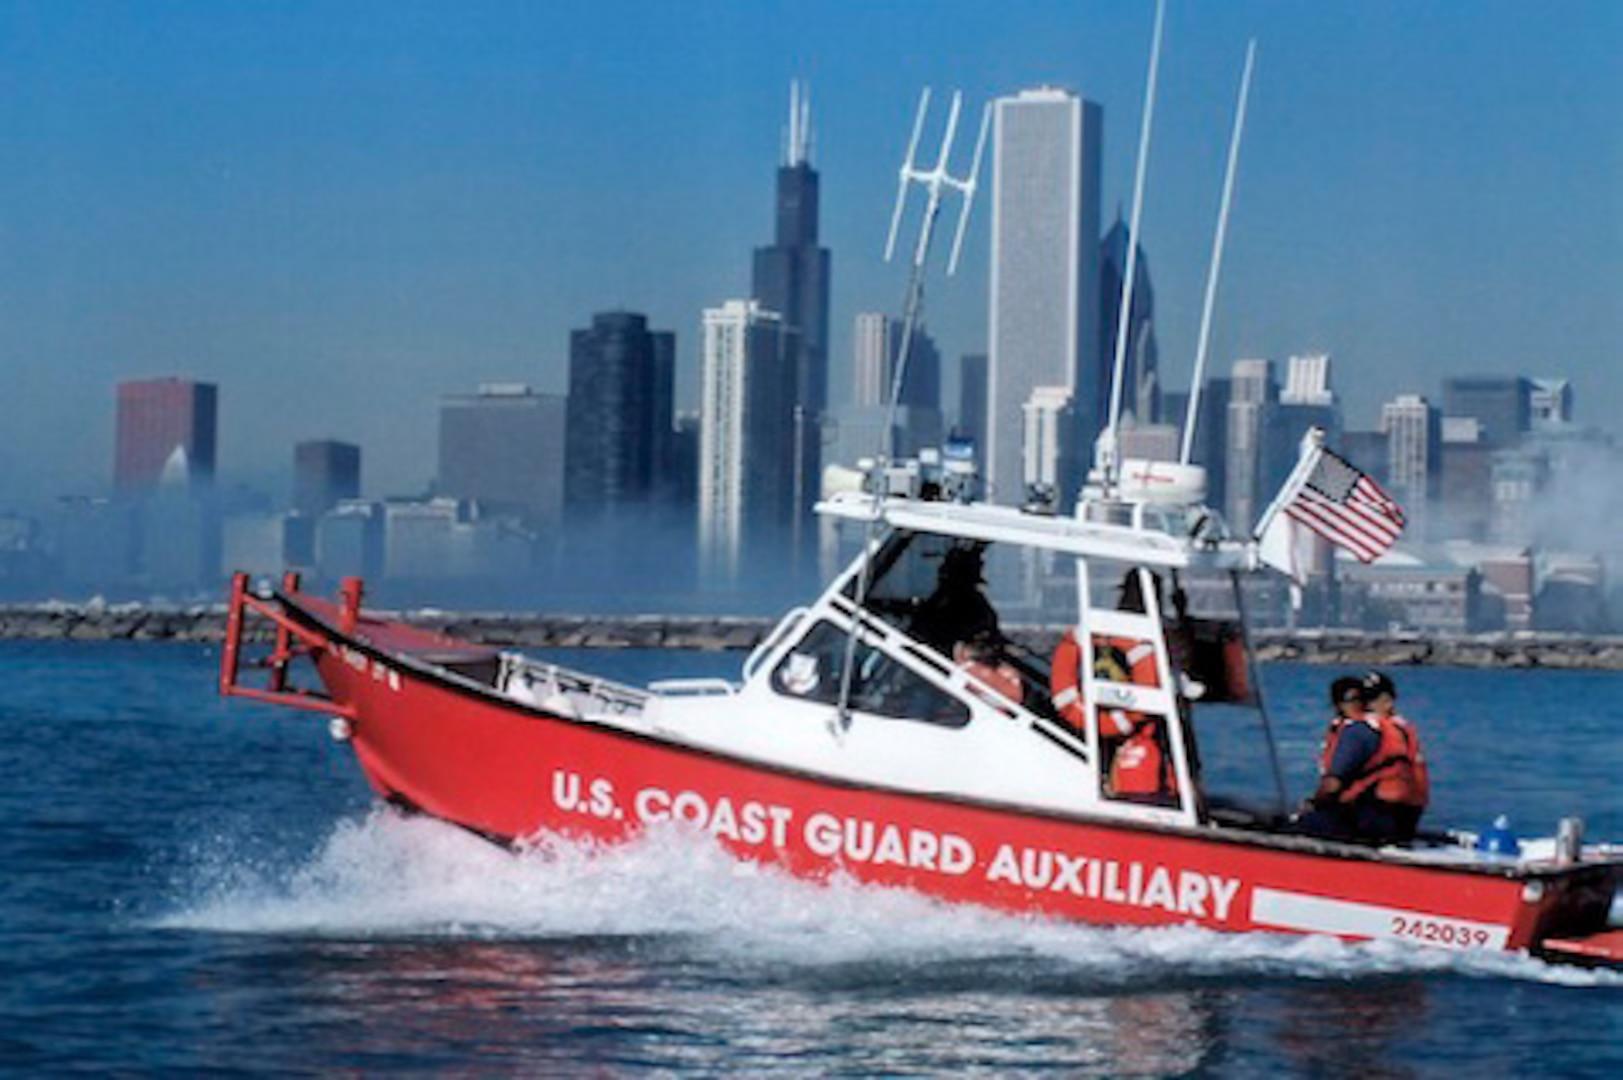 A Coast Guard Auxiliary helping keep boaters safe along southern Lake Michigan.